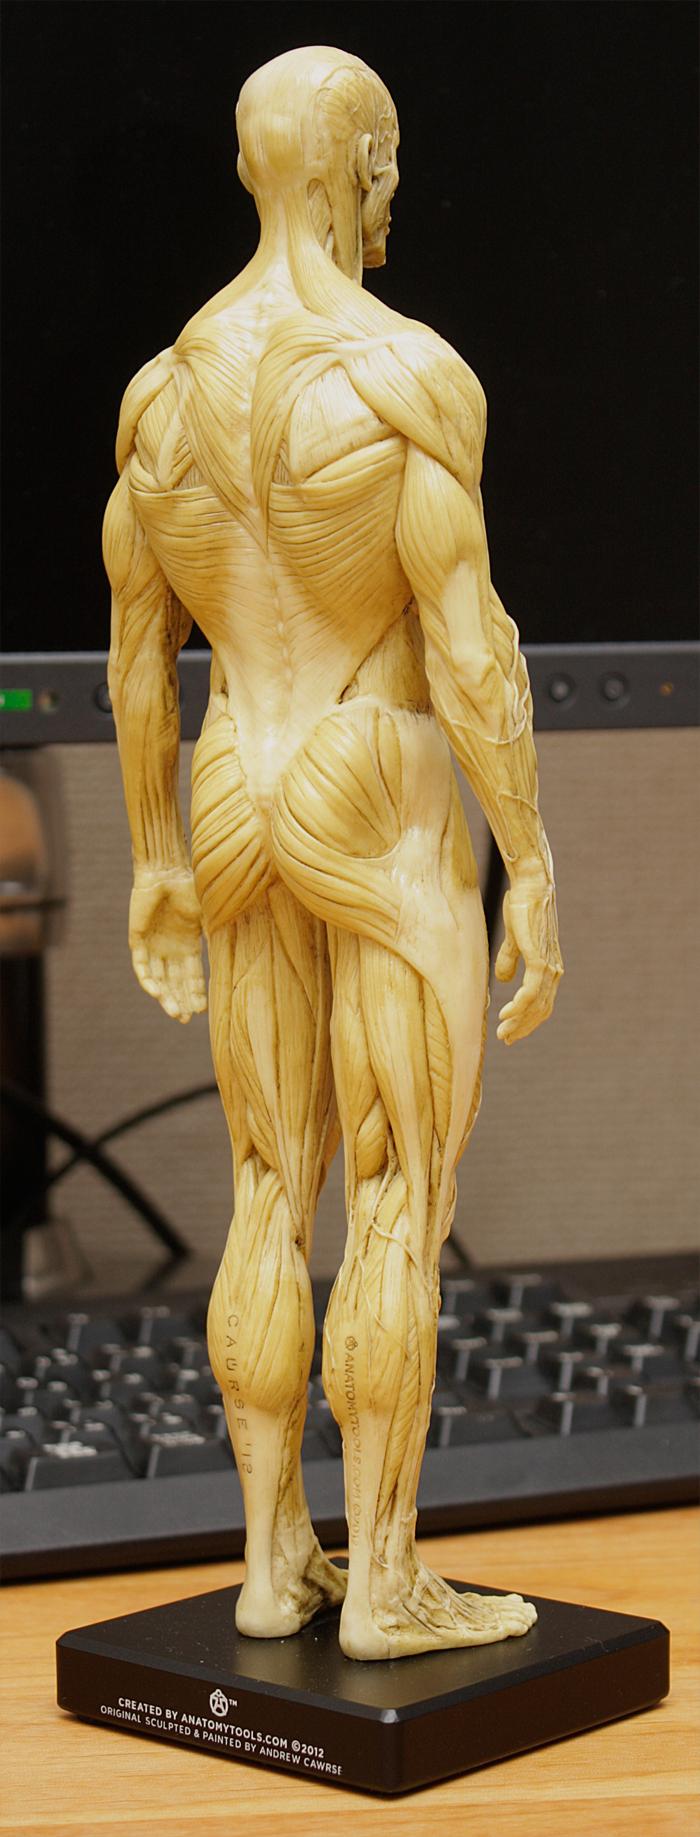 20150131_anatomytools.reference06